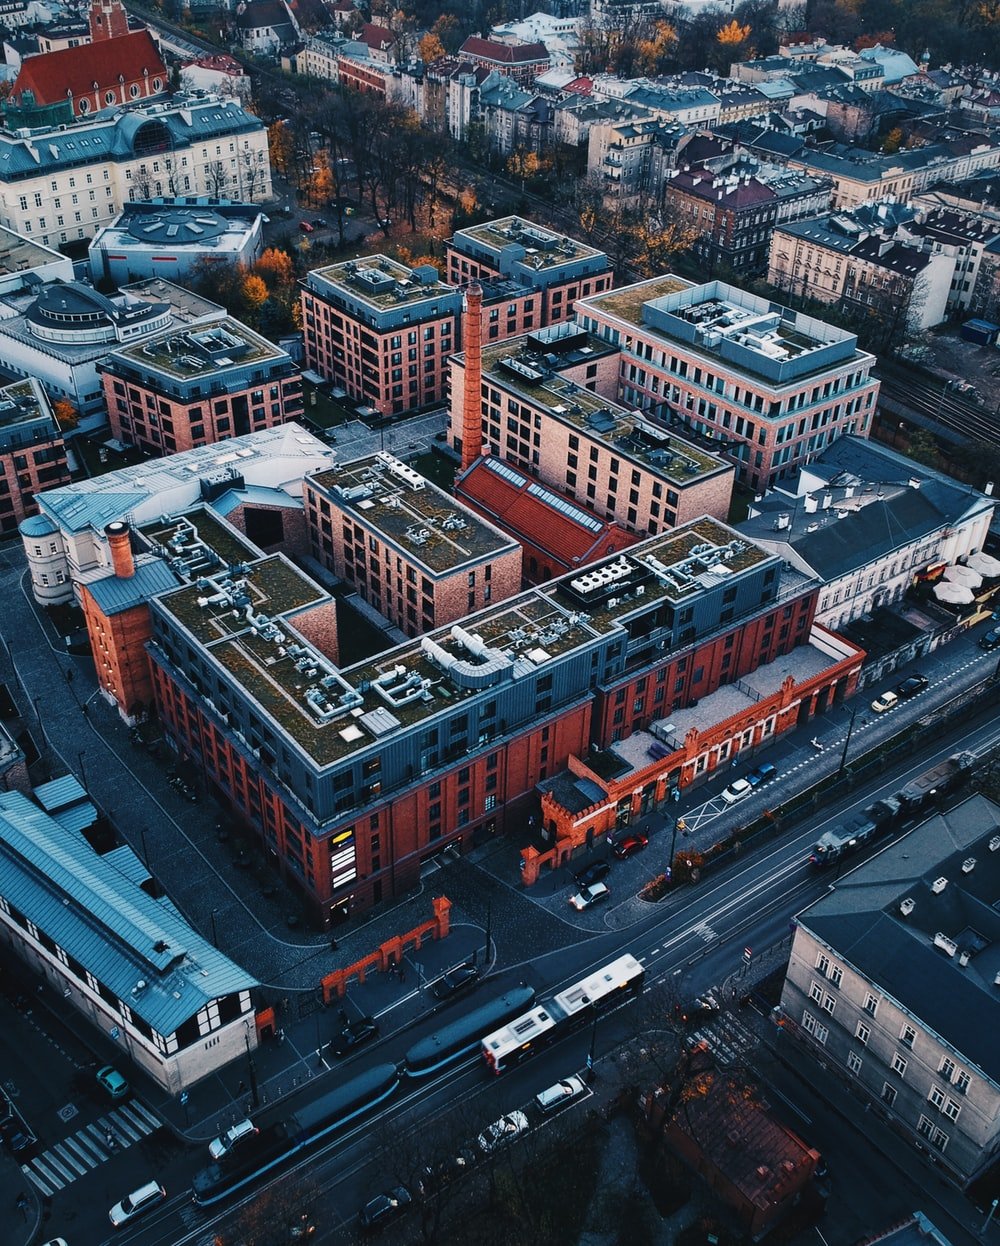 birds eye photography of buildings